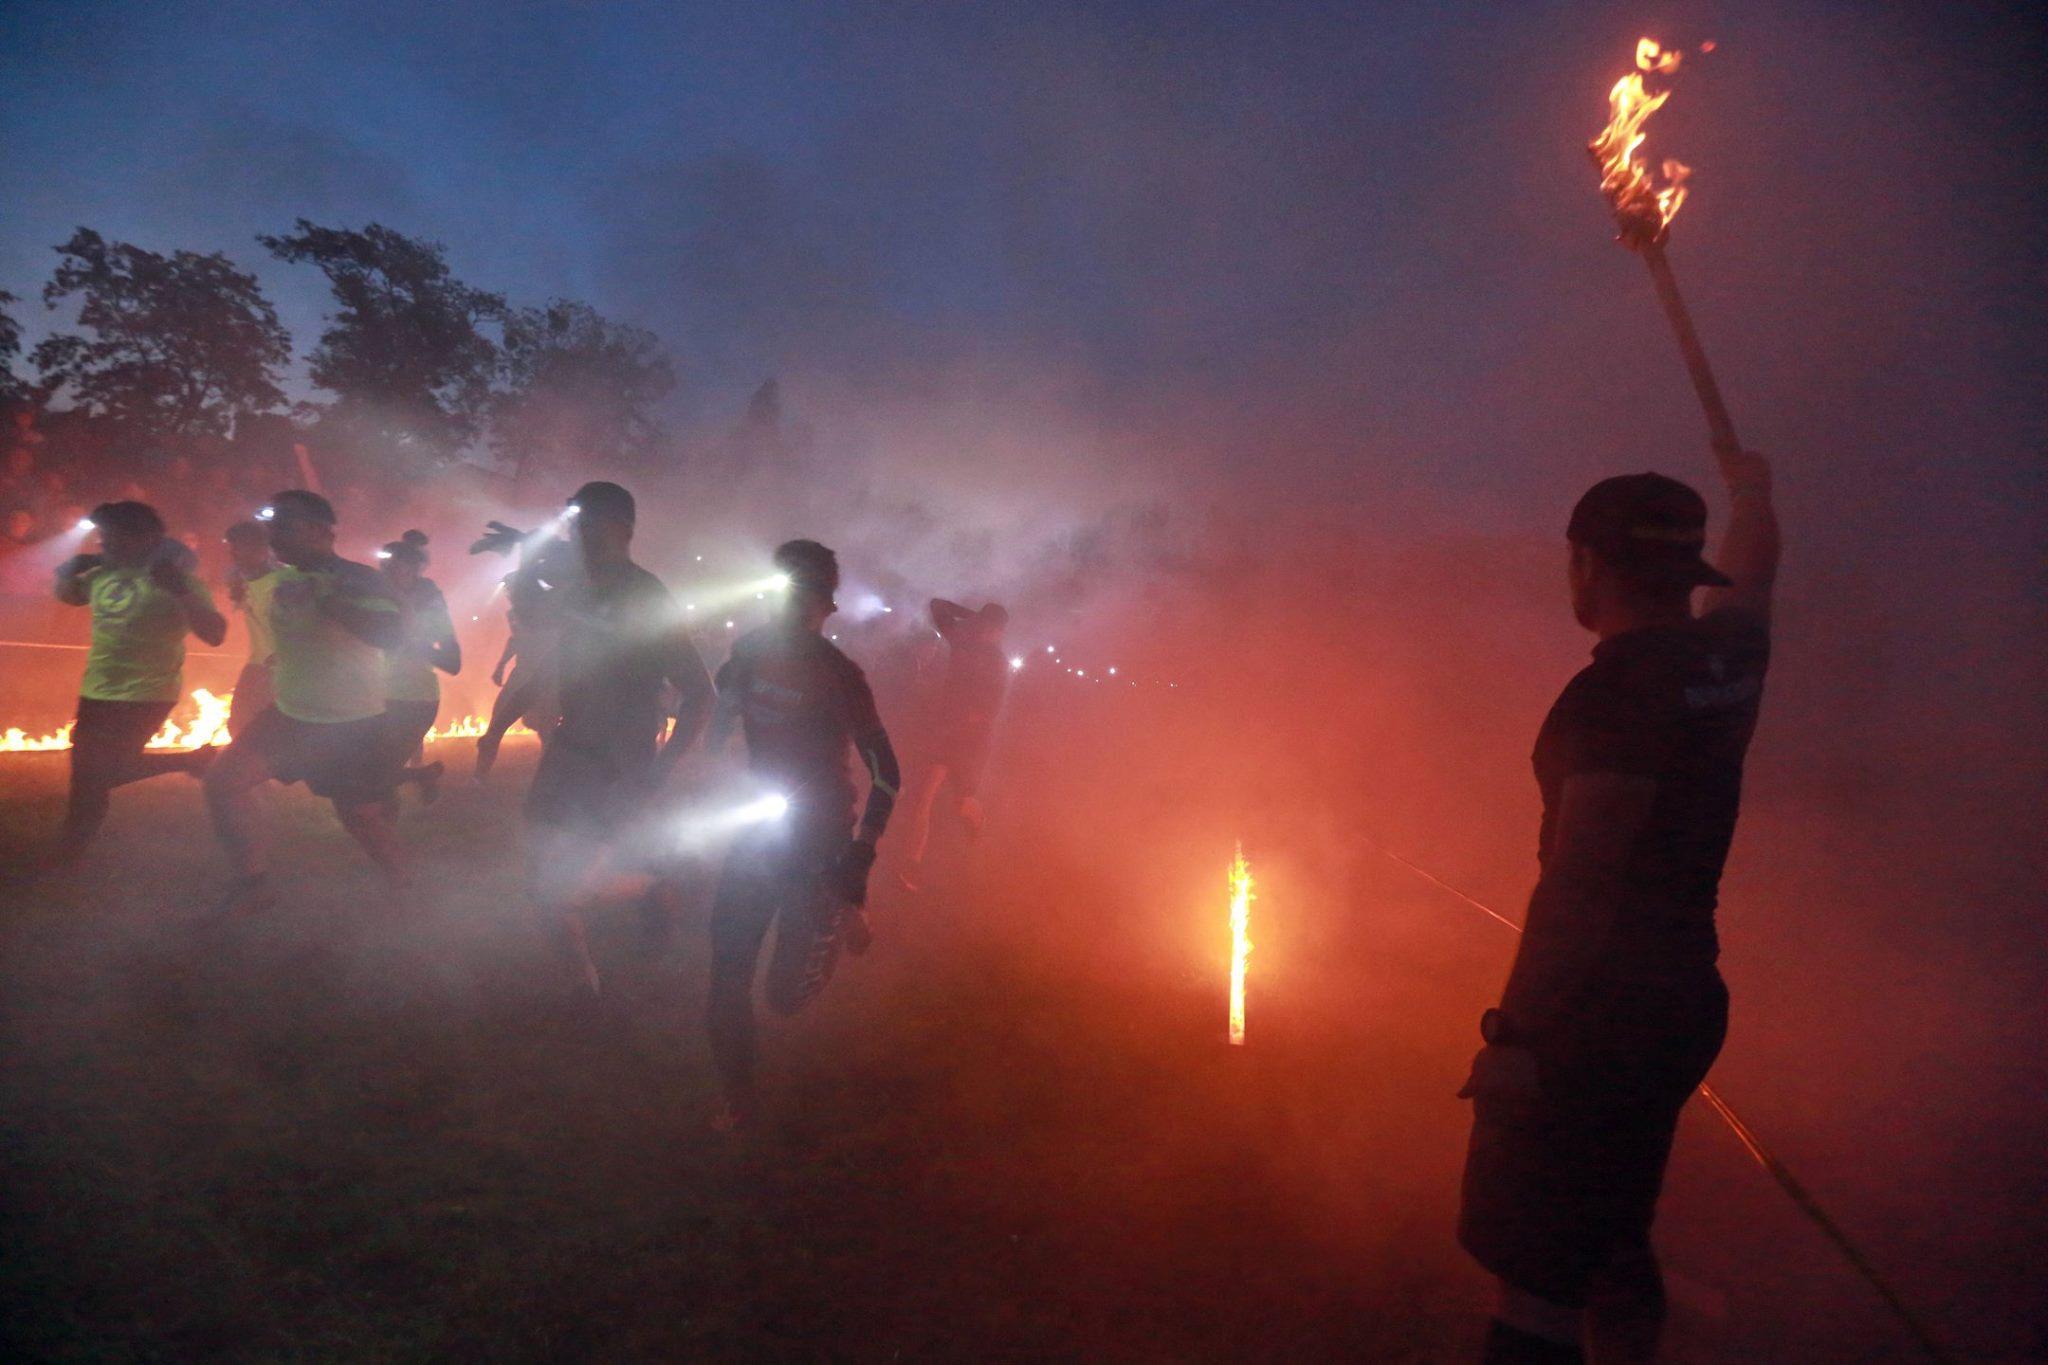 Runmageddon Rekrut Nocny Modlin 2016 zdjęcia, foto (9)